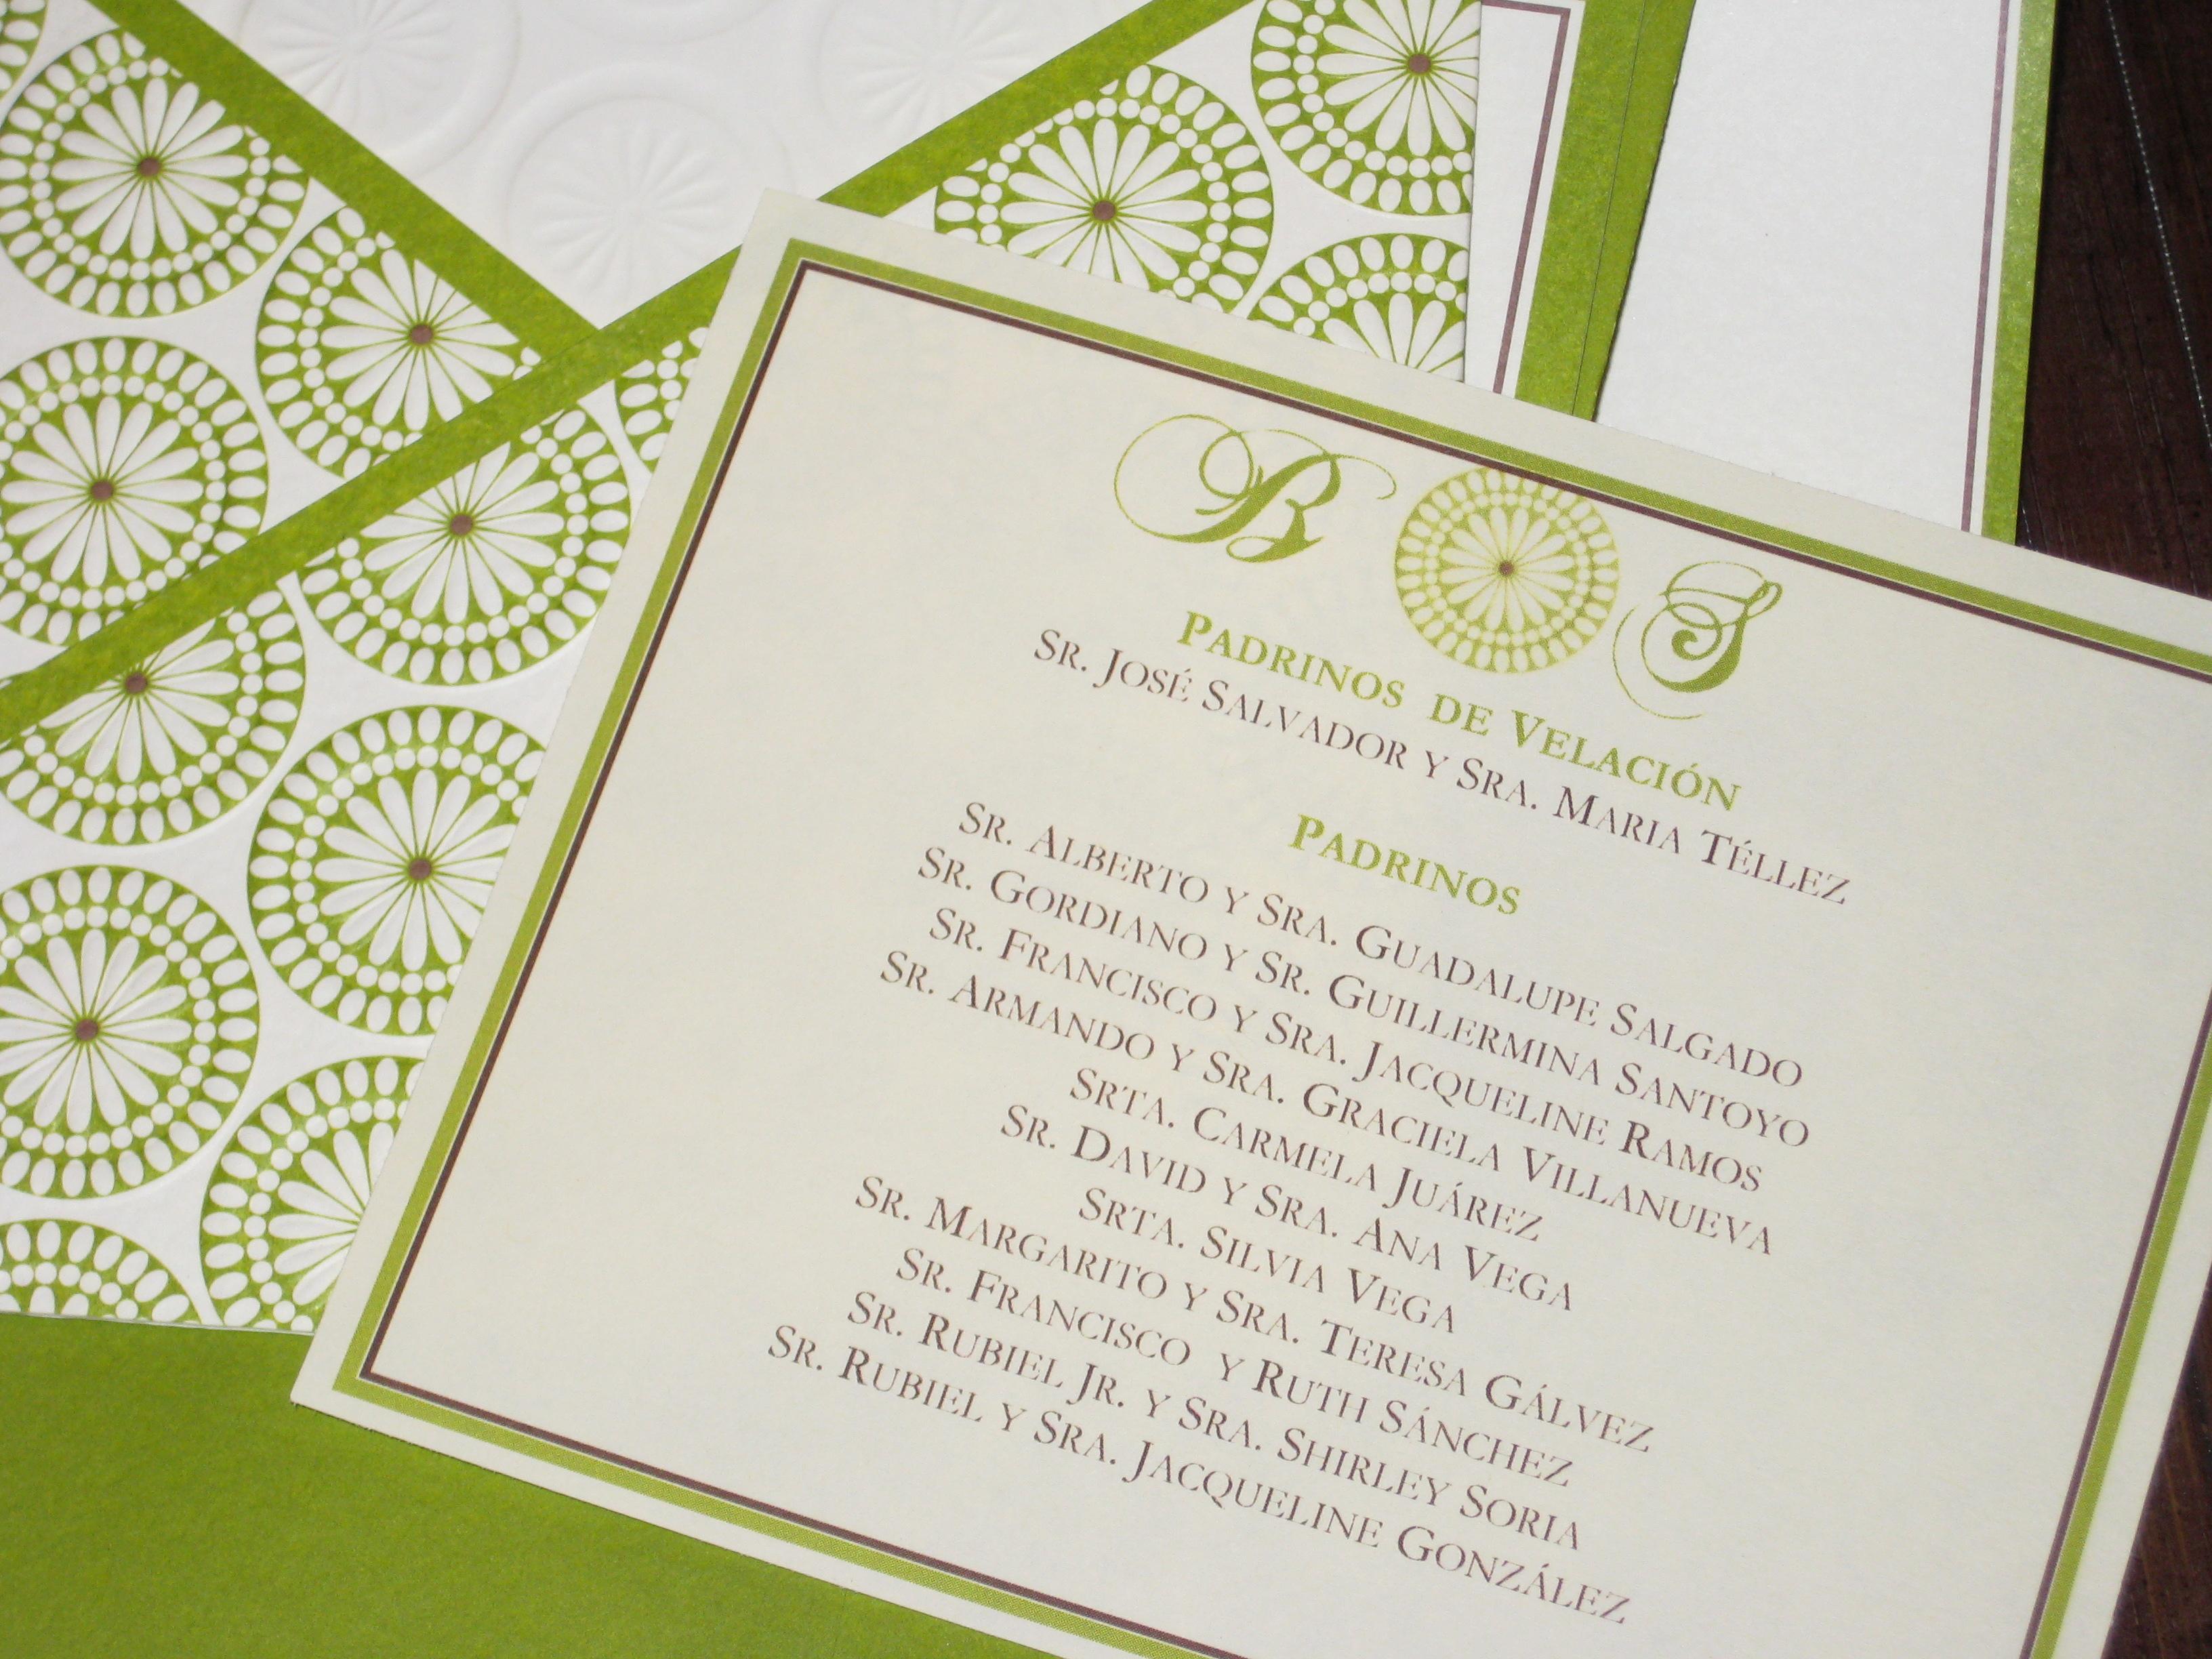 brides green and brown wedding invitation kit wedding invitation kit Advertisements